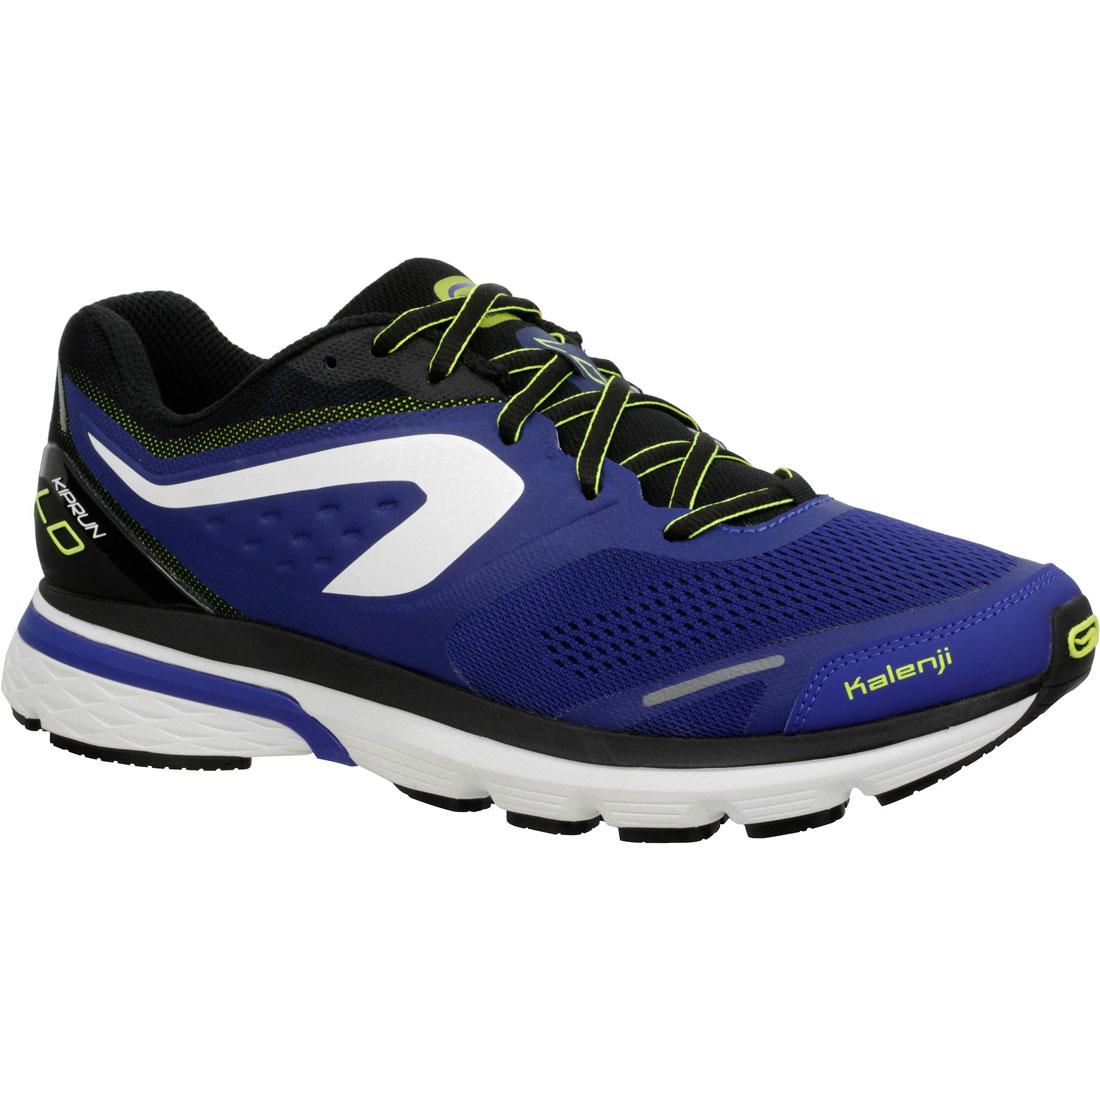 Chaussures de course Kalenji Kiprun LD